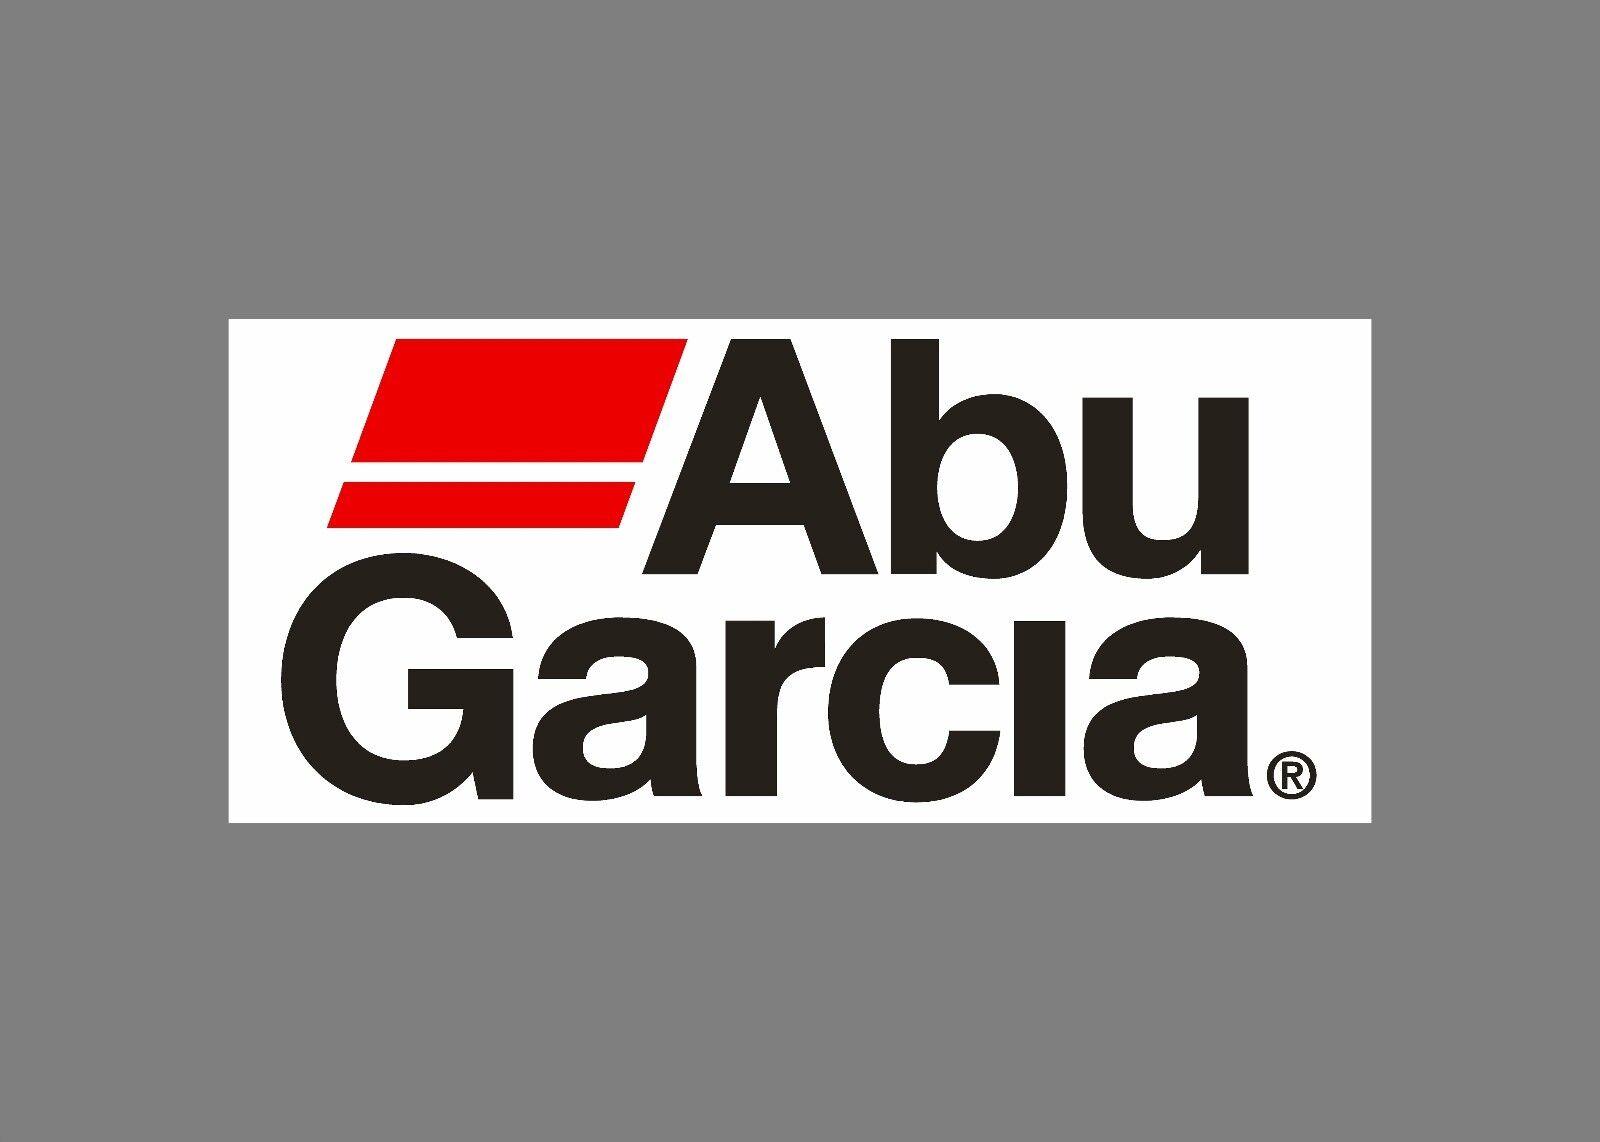 Abu Garcia decals stickers bass boat tournament sponsor fishing rod reel